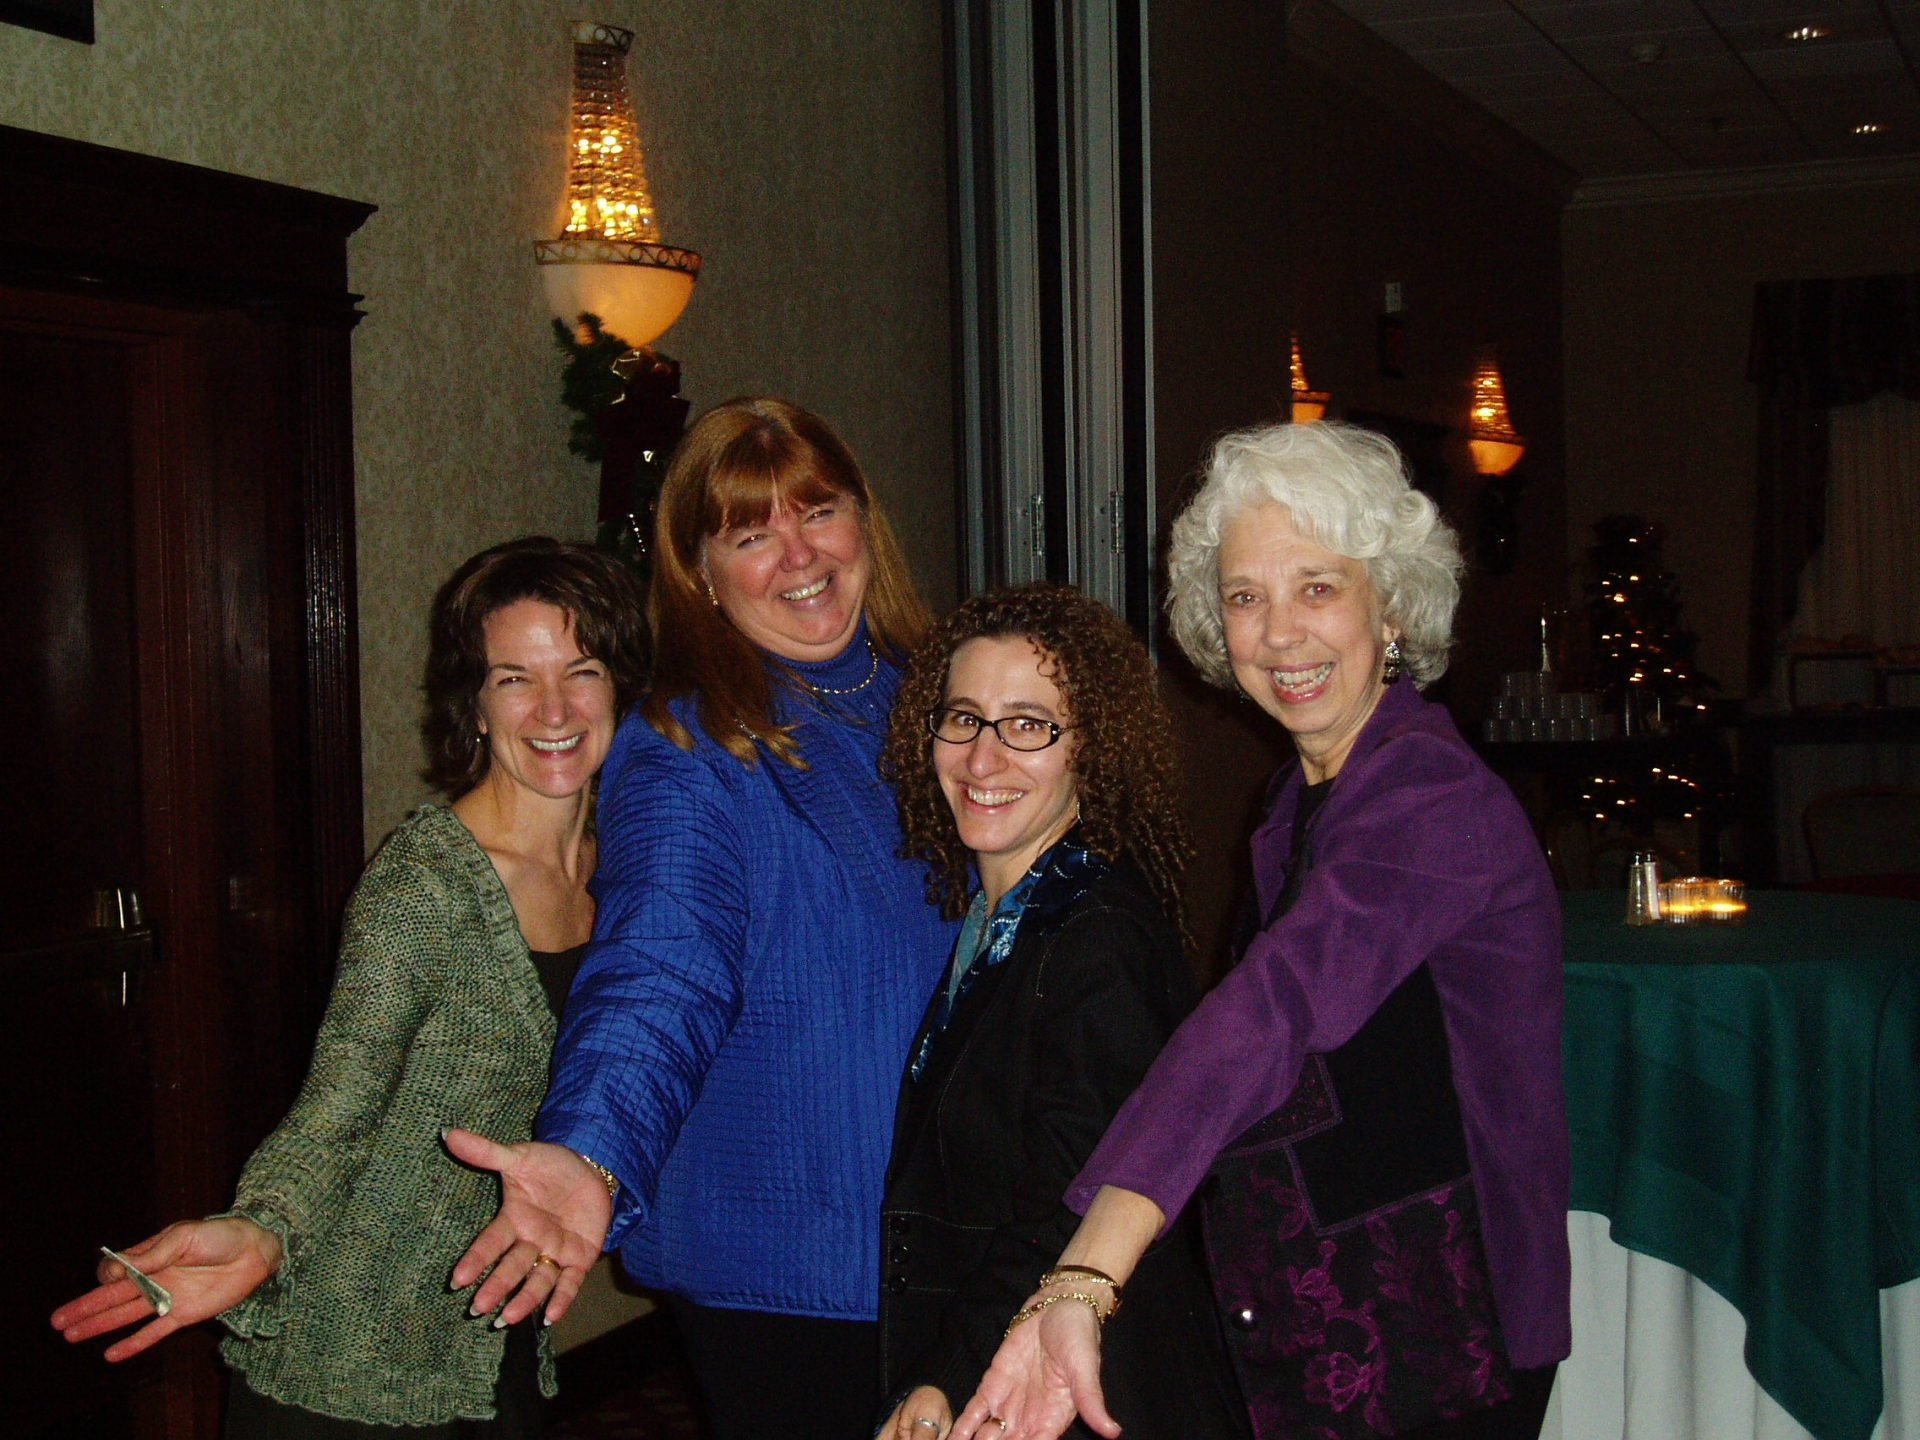 2007 Holiday Party - Marcy, Sue, Sara, Laura